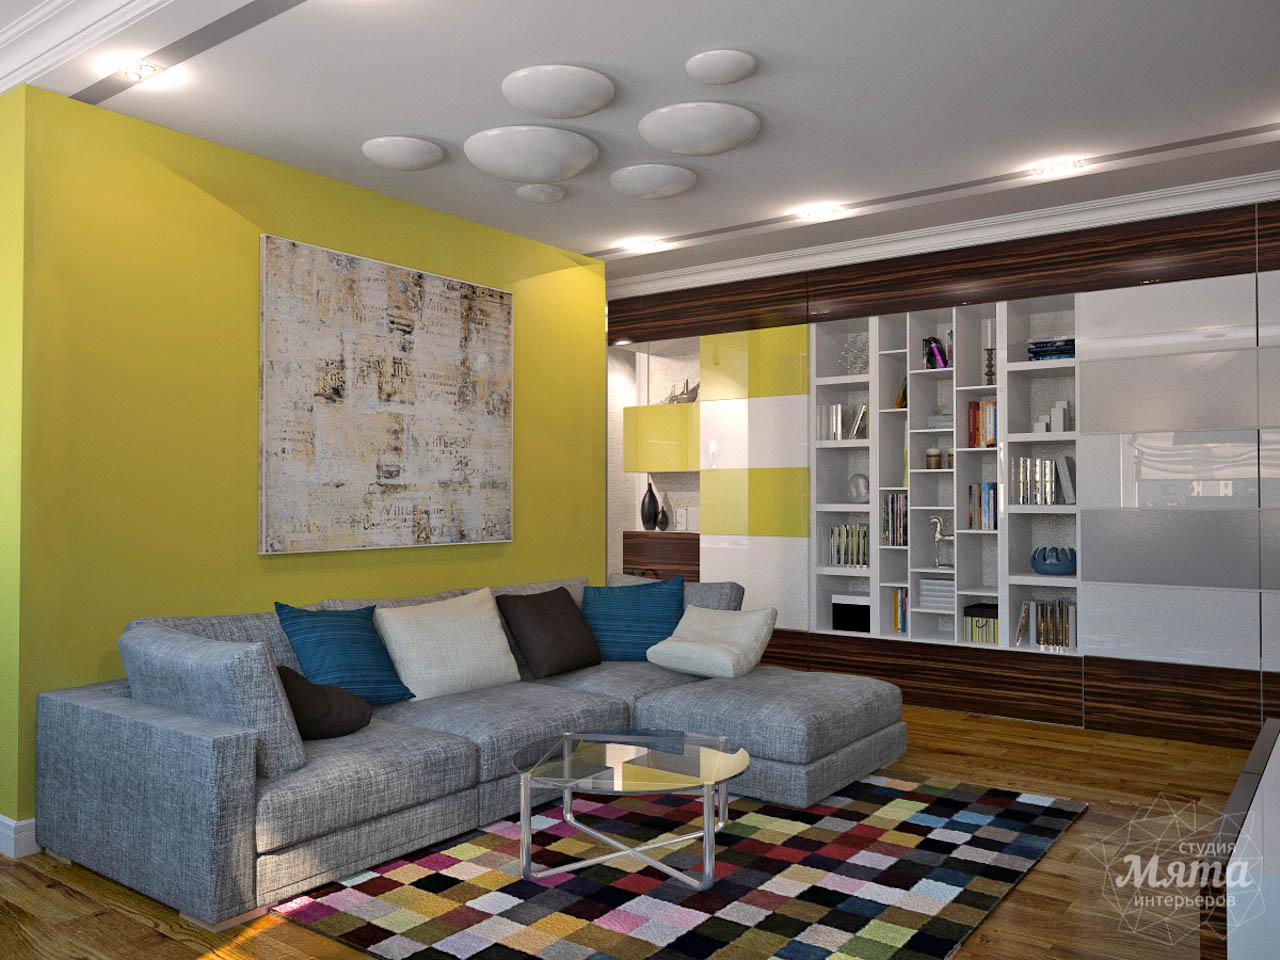 Дизайн интерьера двухкомнатной квартиры по ул. Комсомольская 14 img818959717